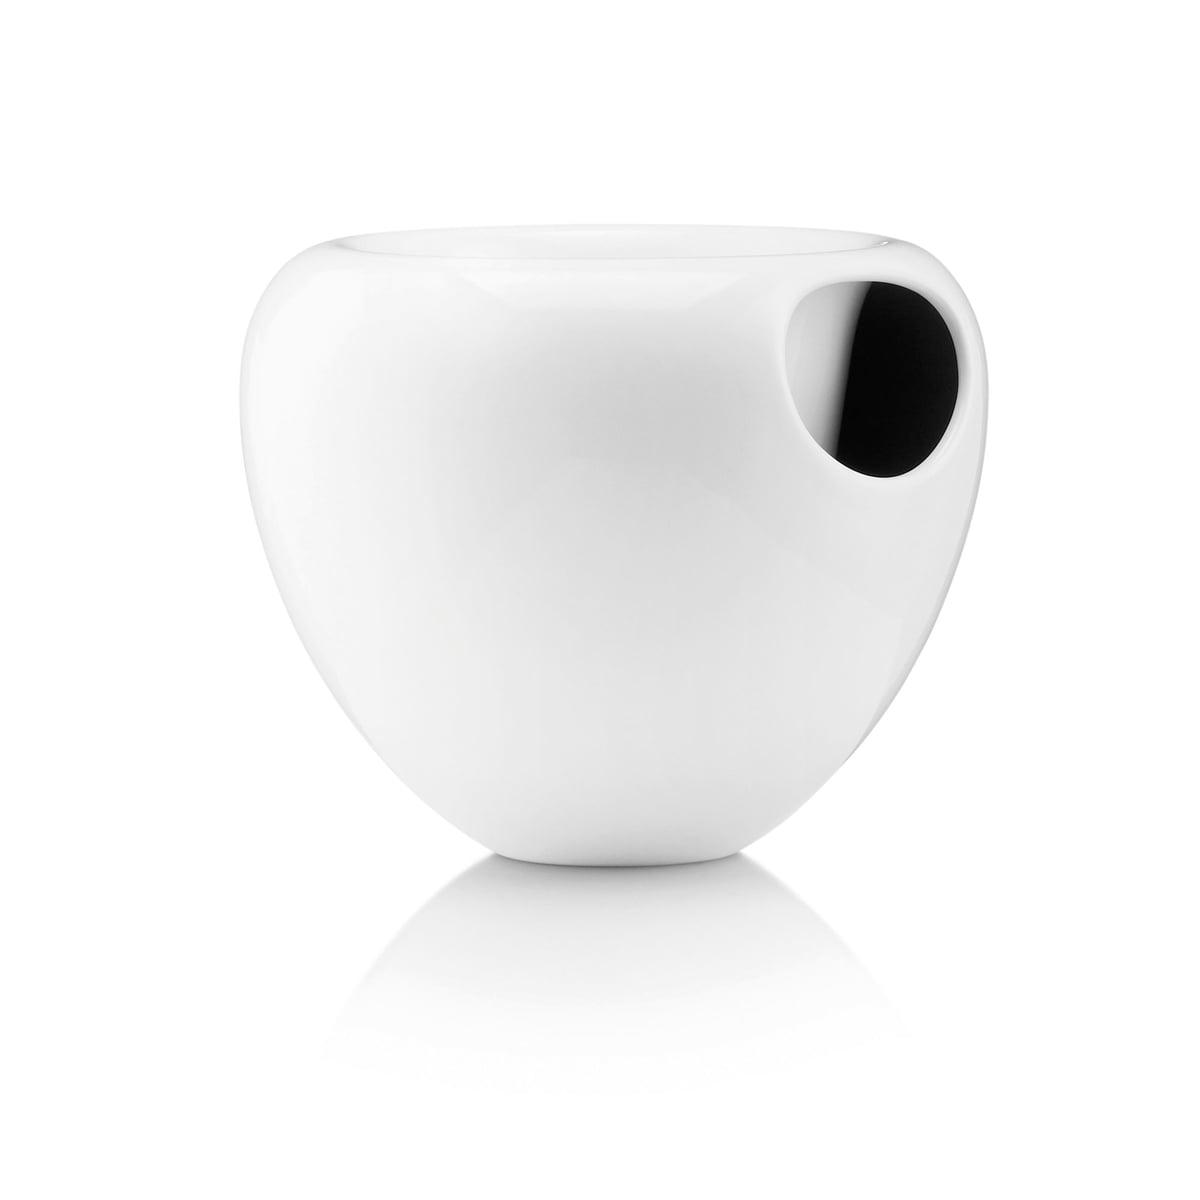 Eva Solo - Orchideentopf, weiß | Garten > Pflanzen | Weiß | Glasierte fayence-keramik | Eva Solo